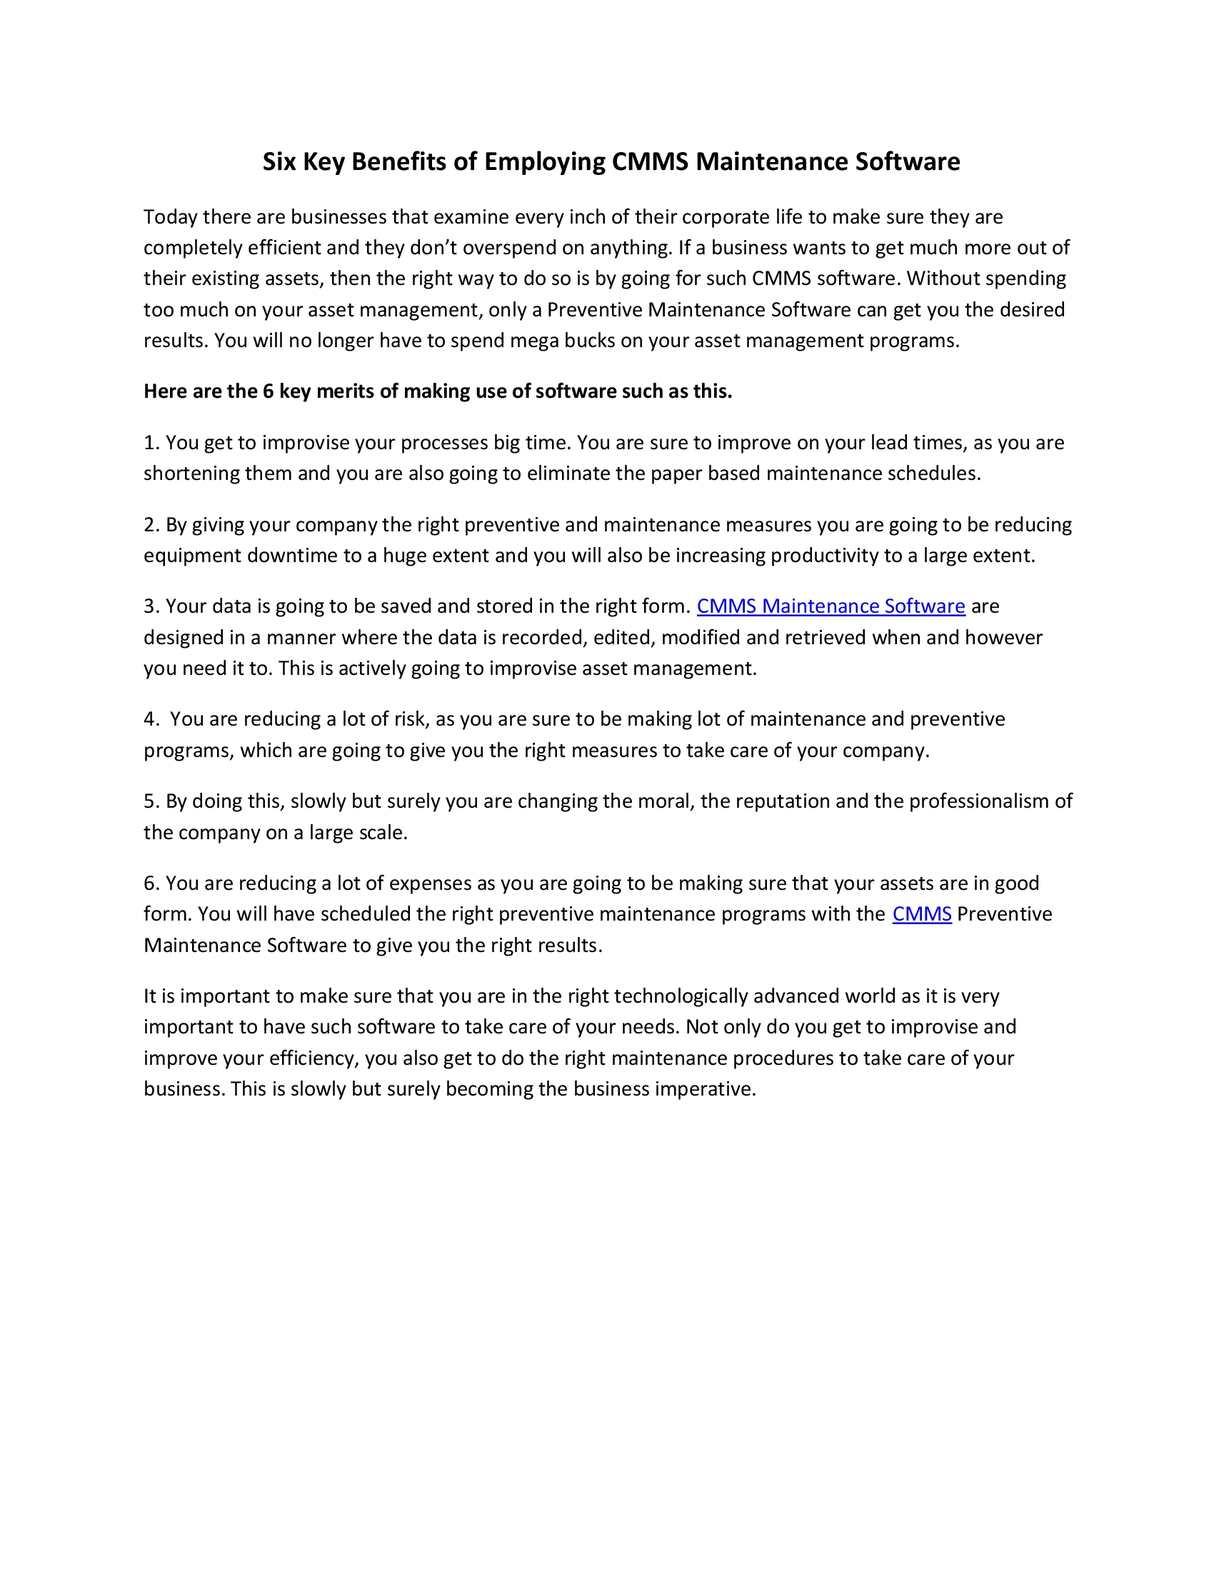 Calaméo - Six Key Benefits of Employing CMMS Maintenance